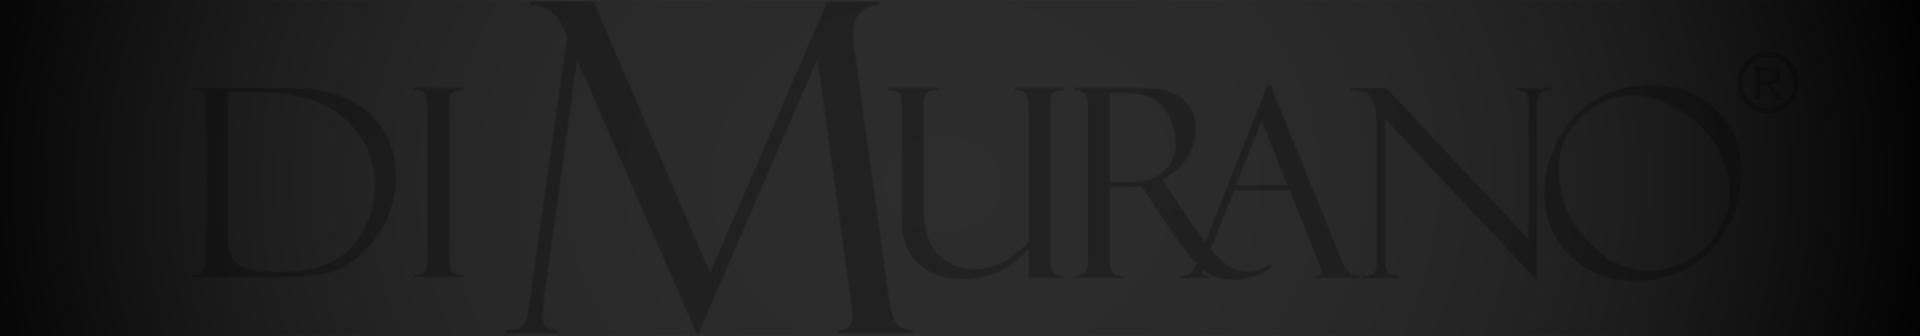 Cristais Di Murano